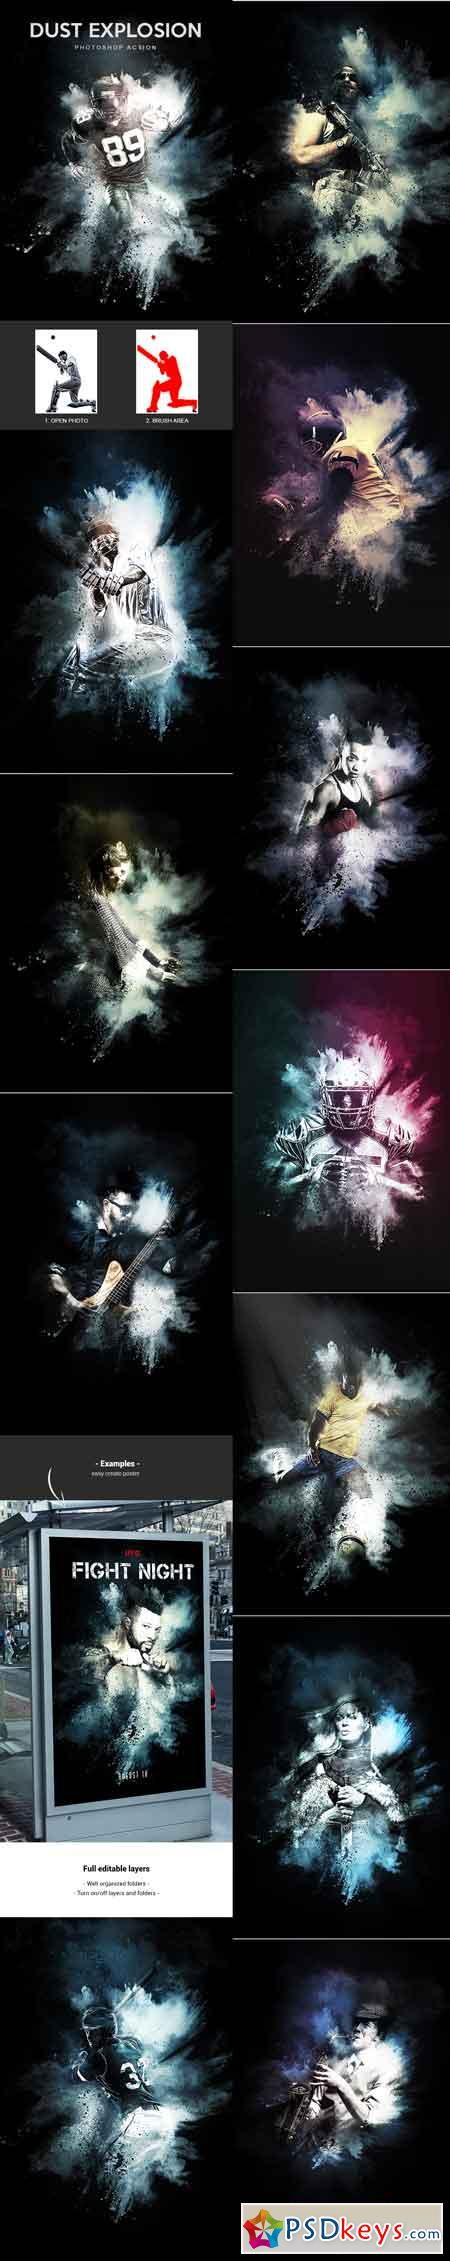 Dust Explosion - Photoshop Action 22601864